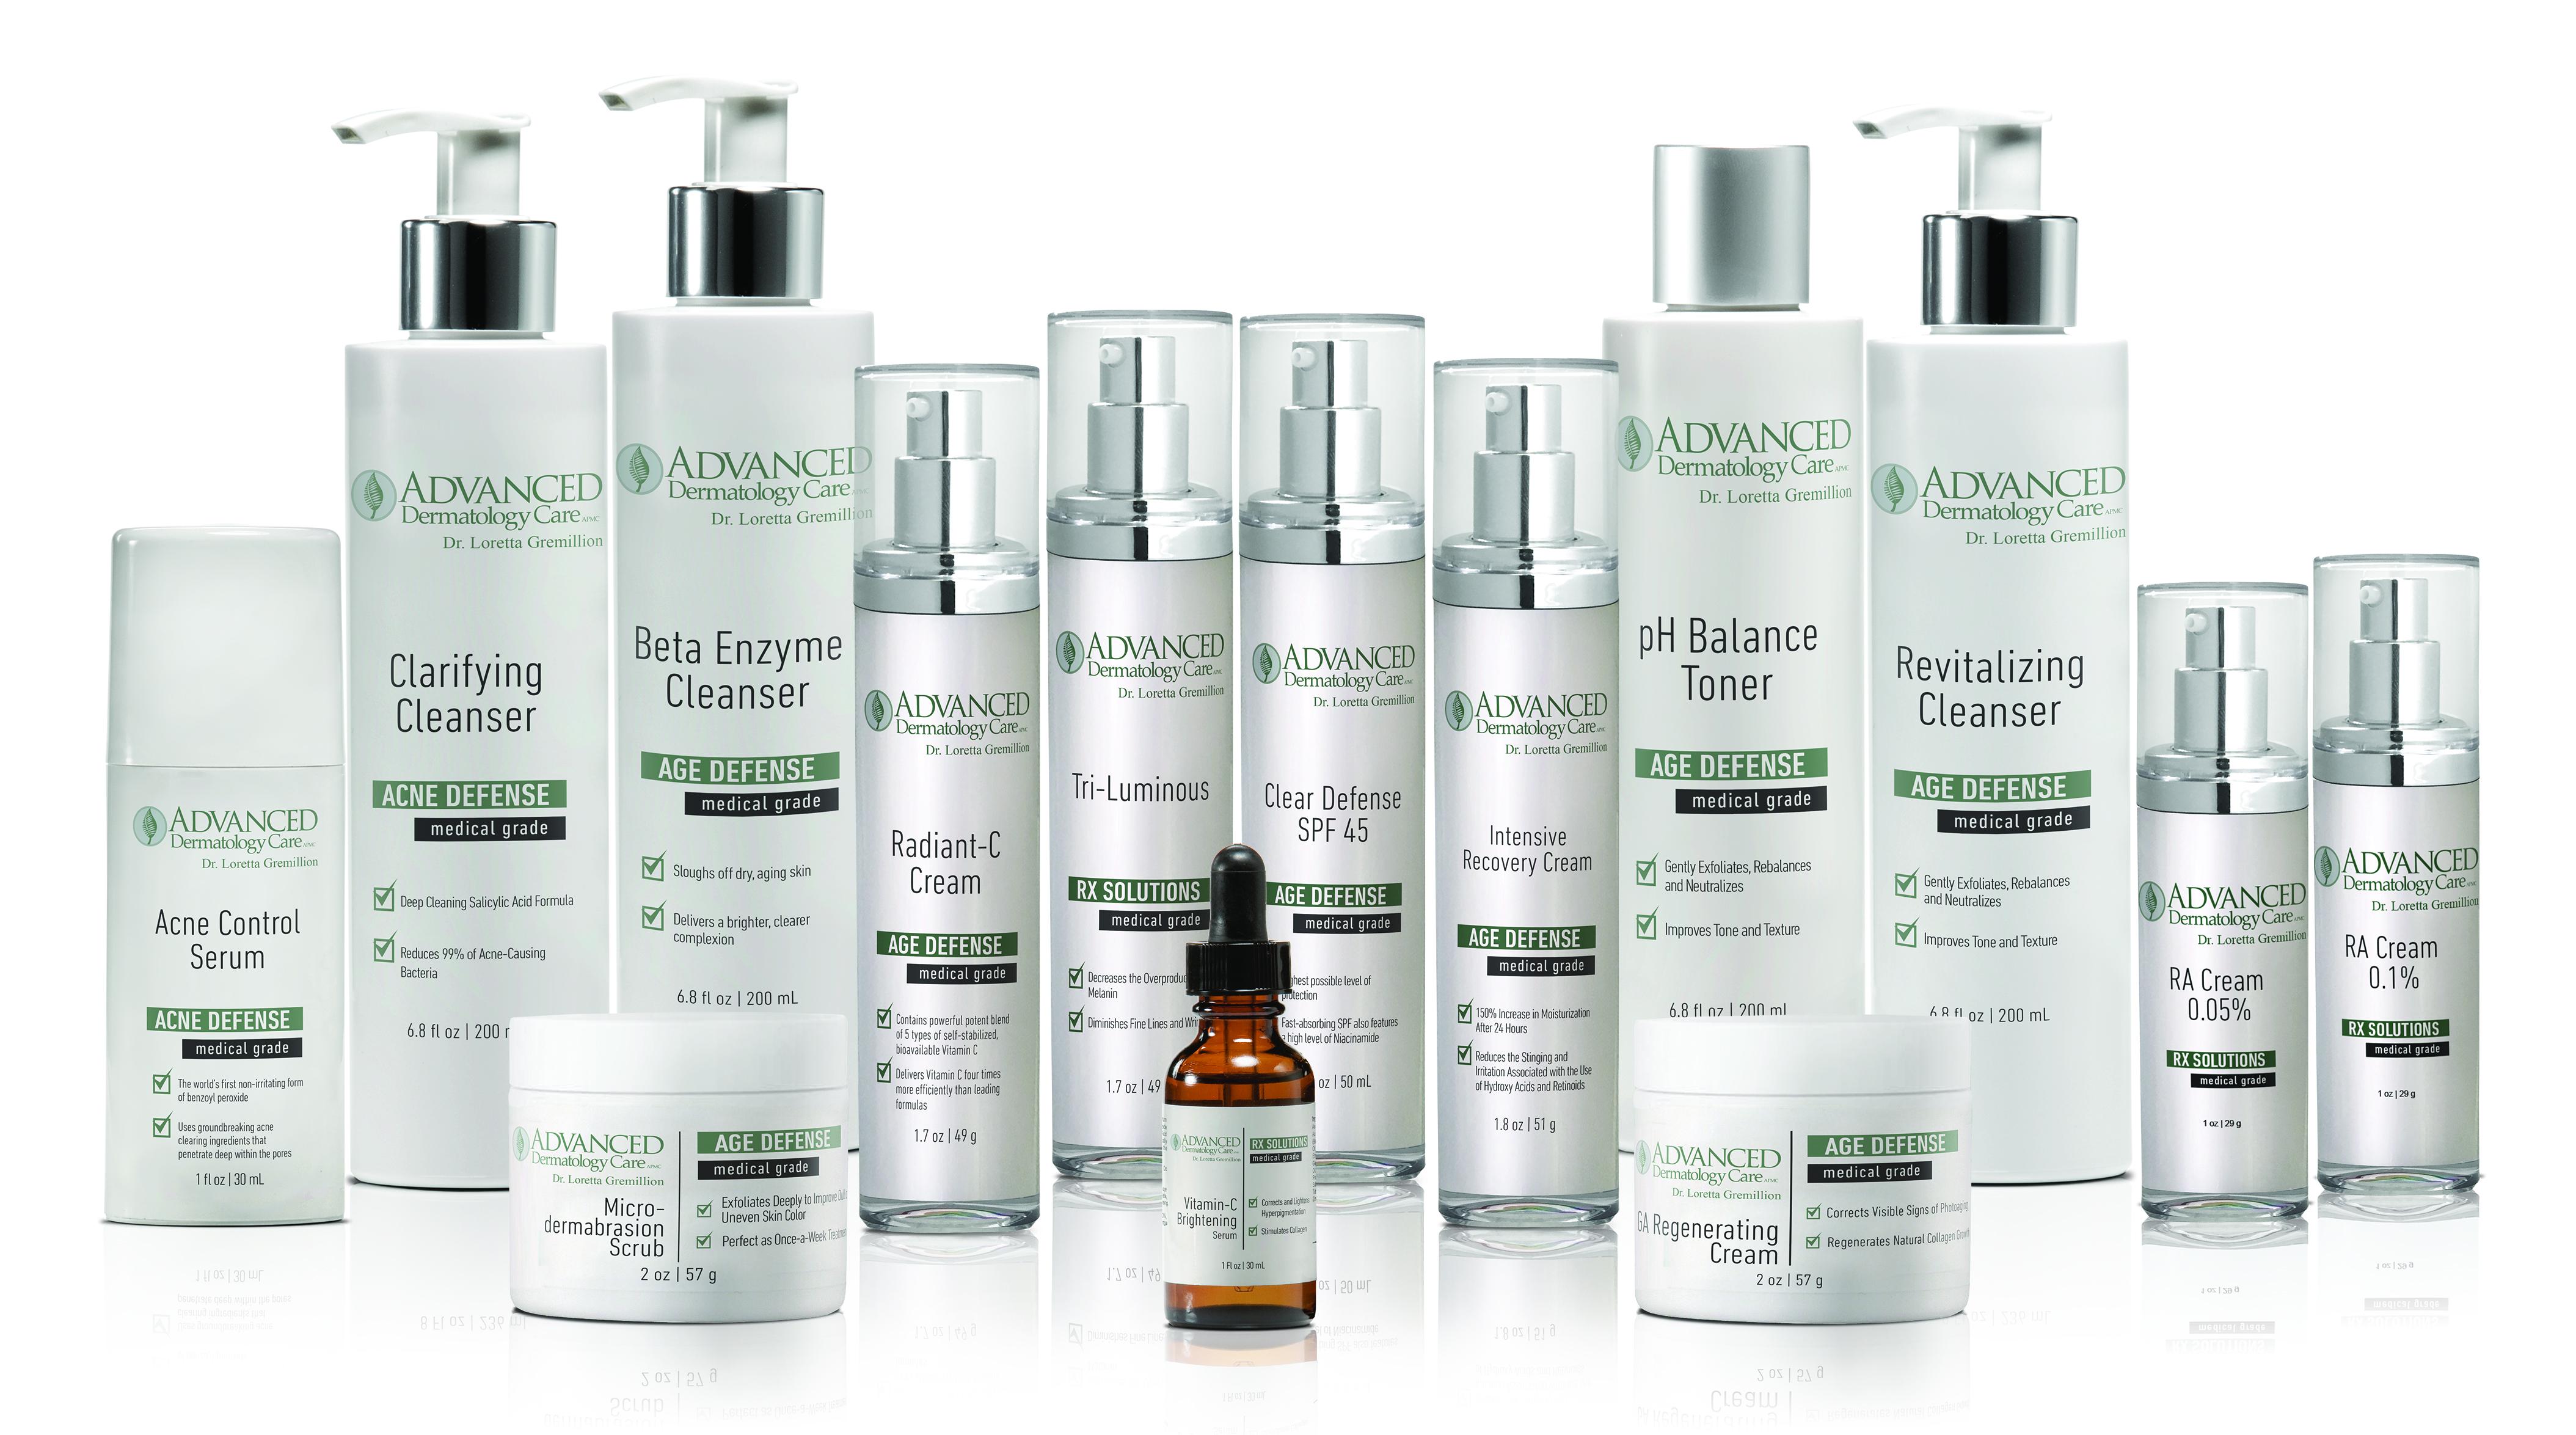 Skin Care Products Monroe Cosmetic Dermatology La Dermatologist